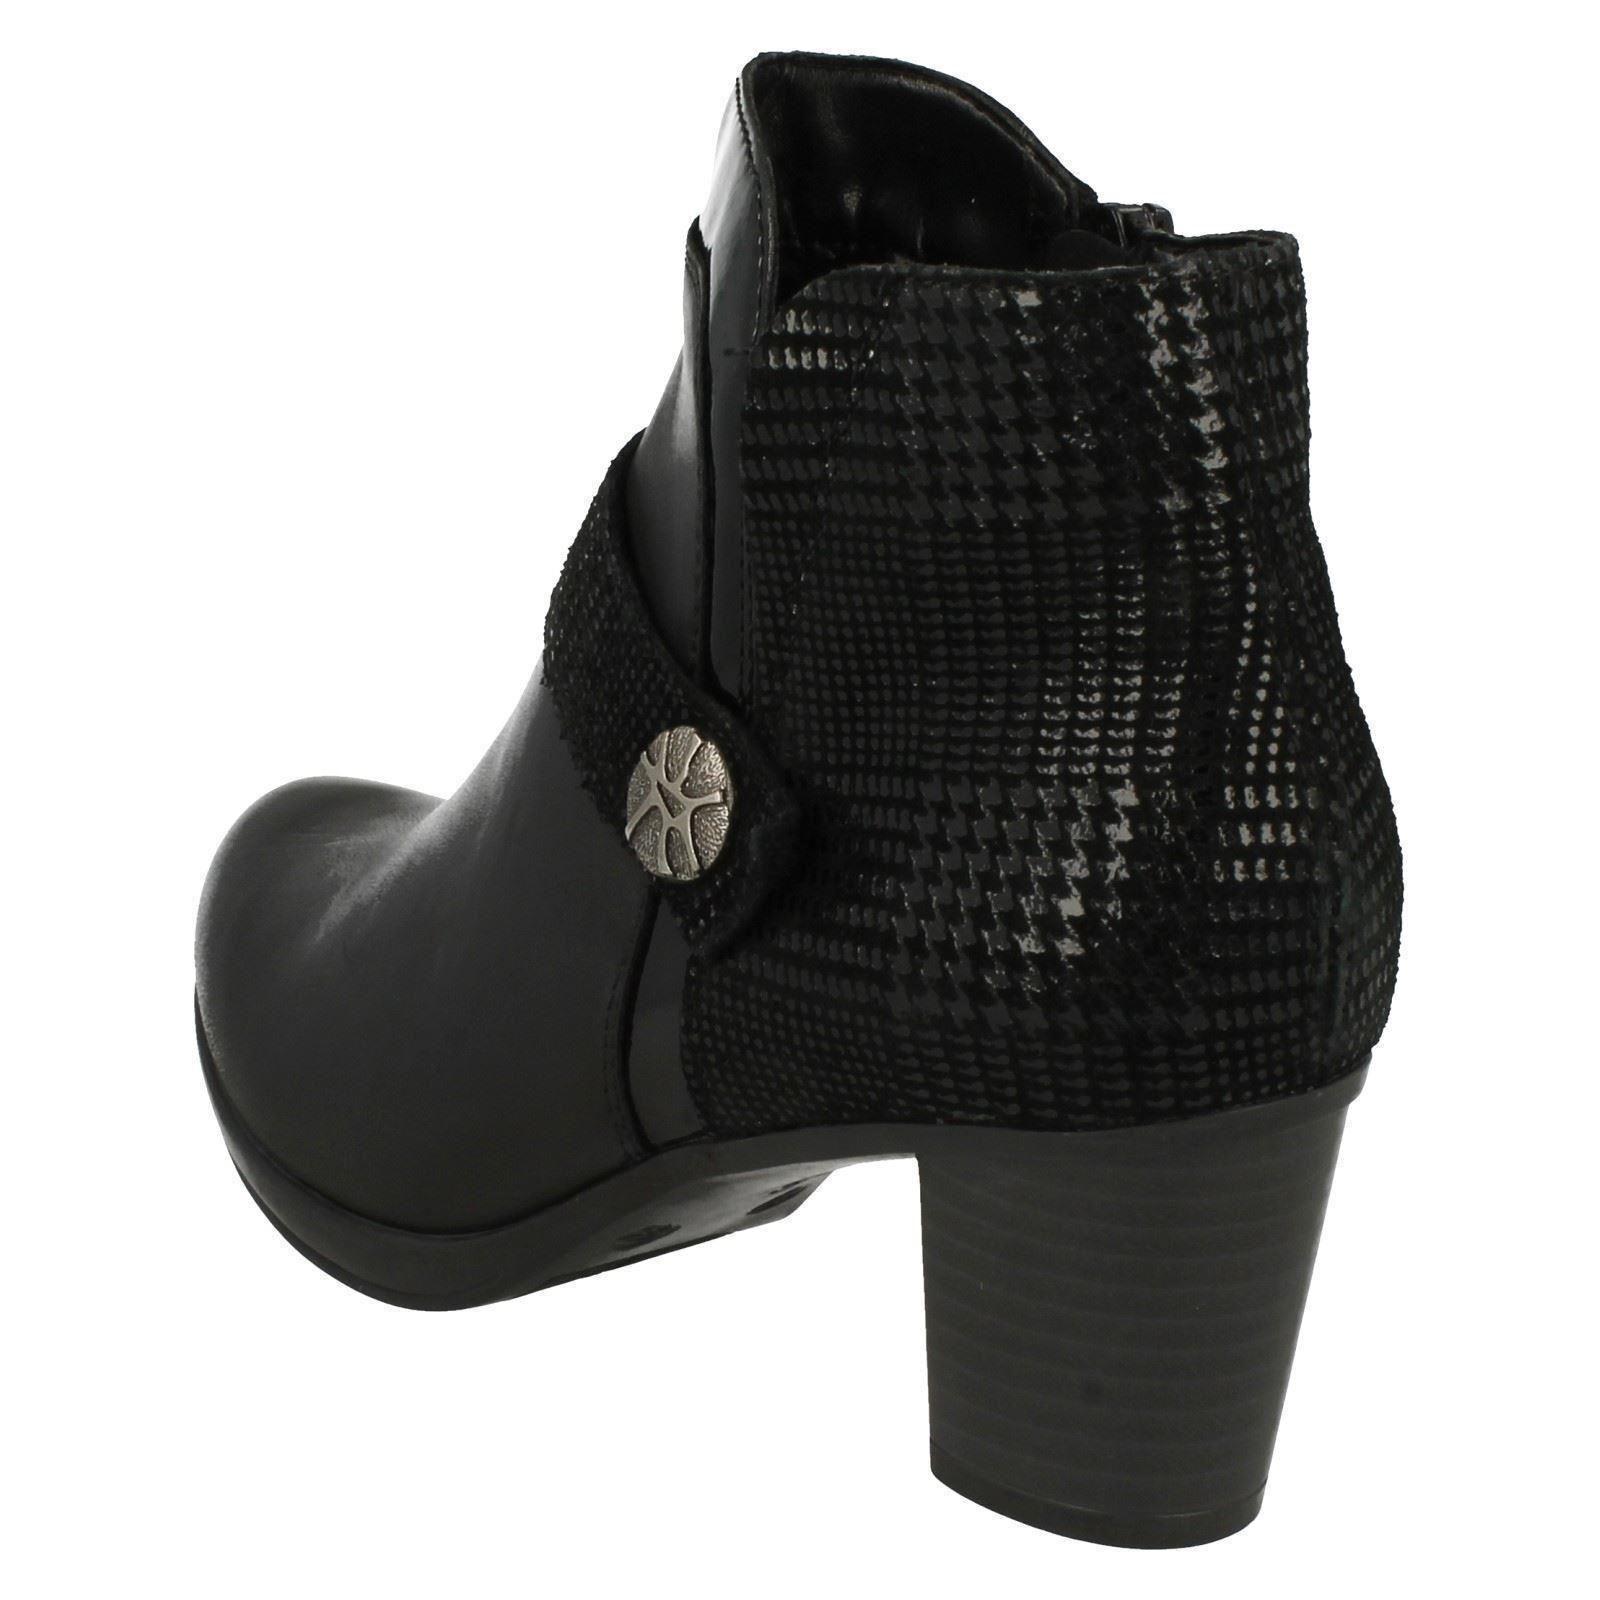 Damas Remonte R1571 Rojo o Negro Cuero Inteligente botas botas botas al tobillo con cremallera e1526b